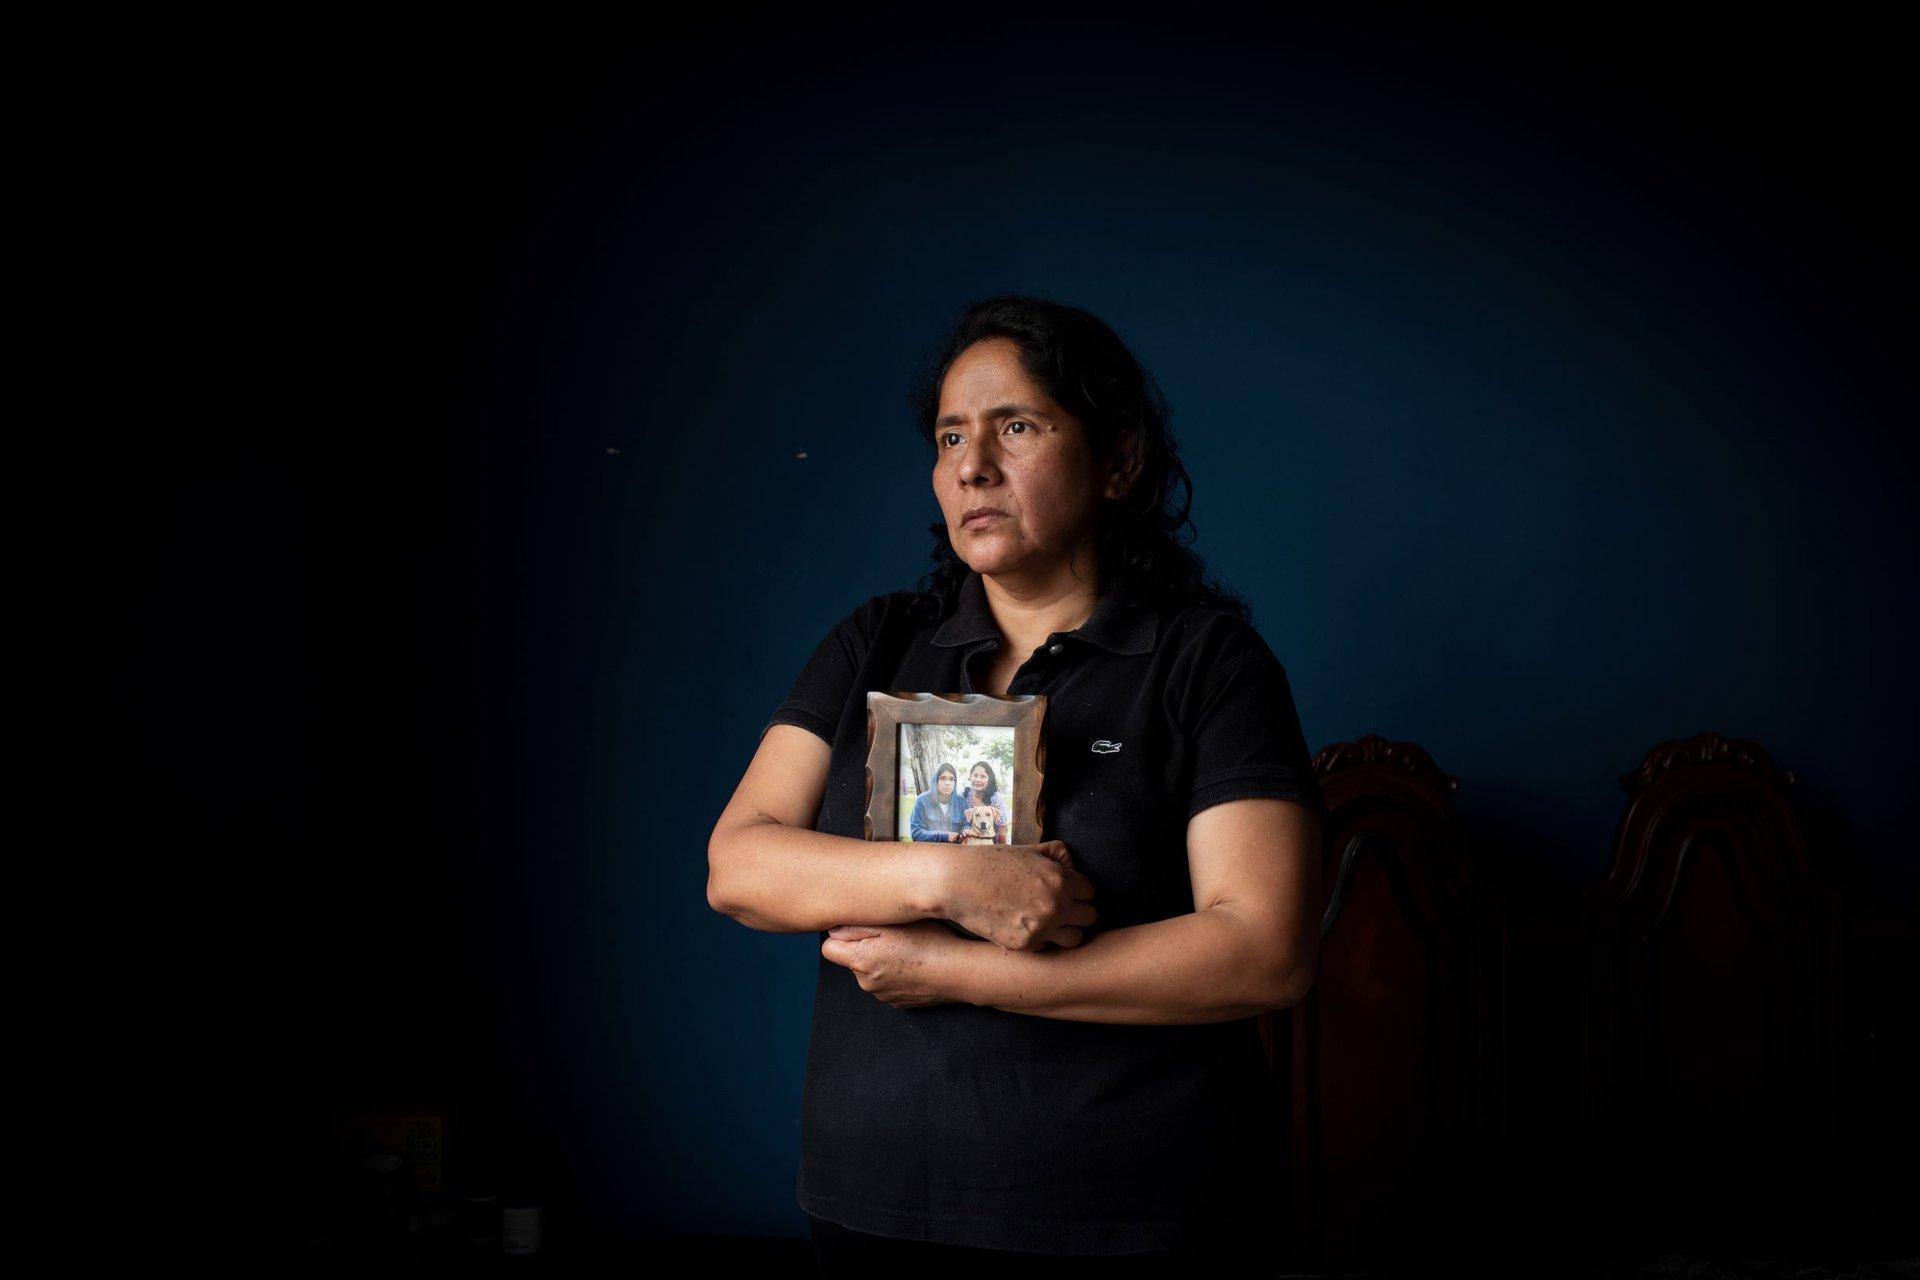 Jon Cordero Morales, 24 años